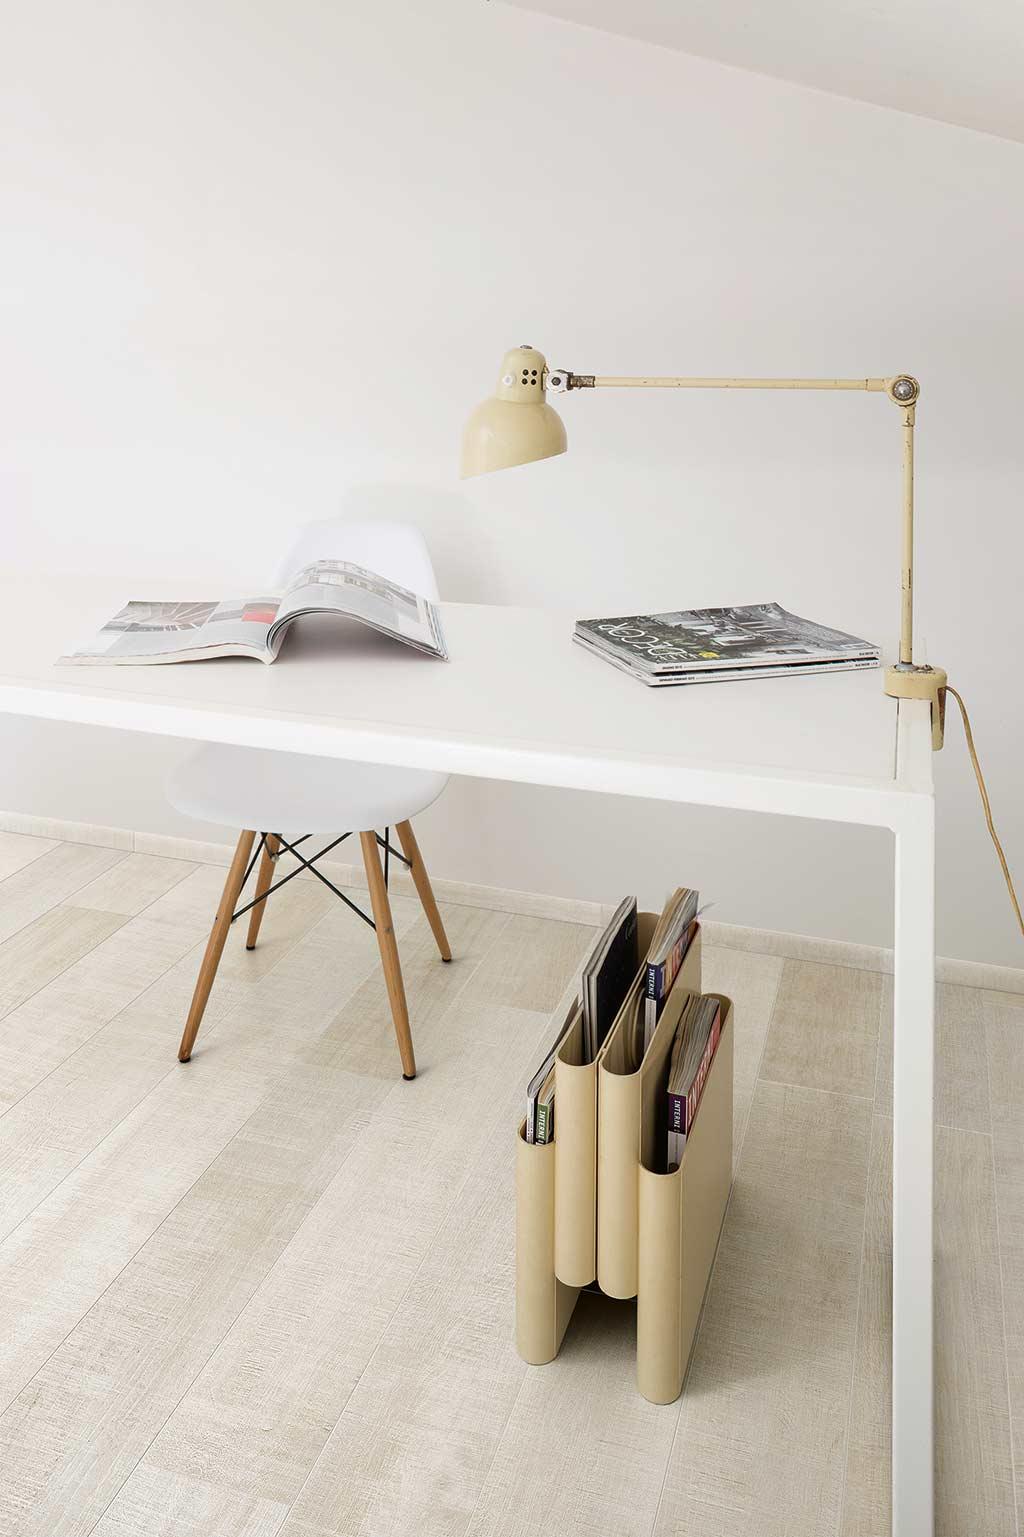 Casa-dolce-casa-wooden-tile_portfolio-2